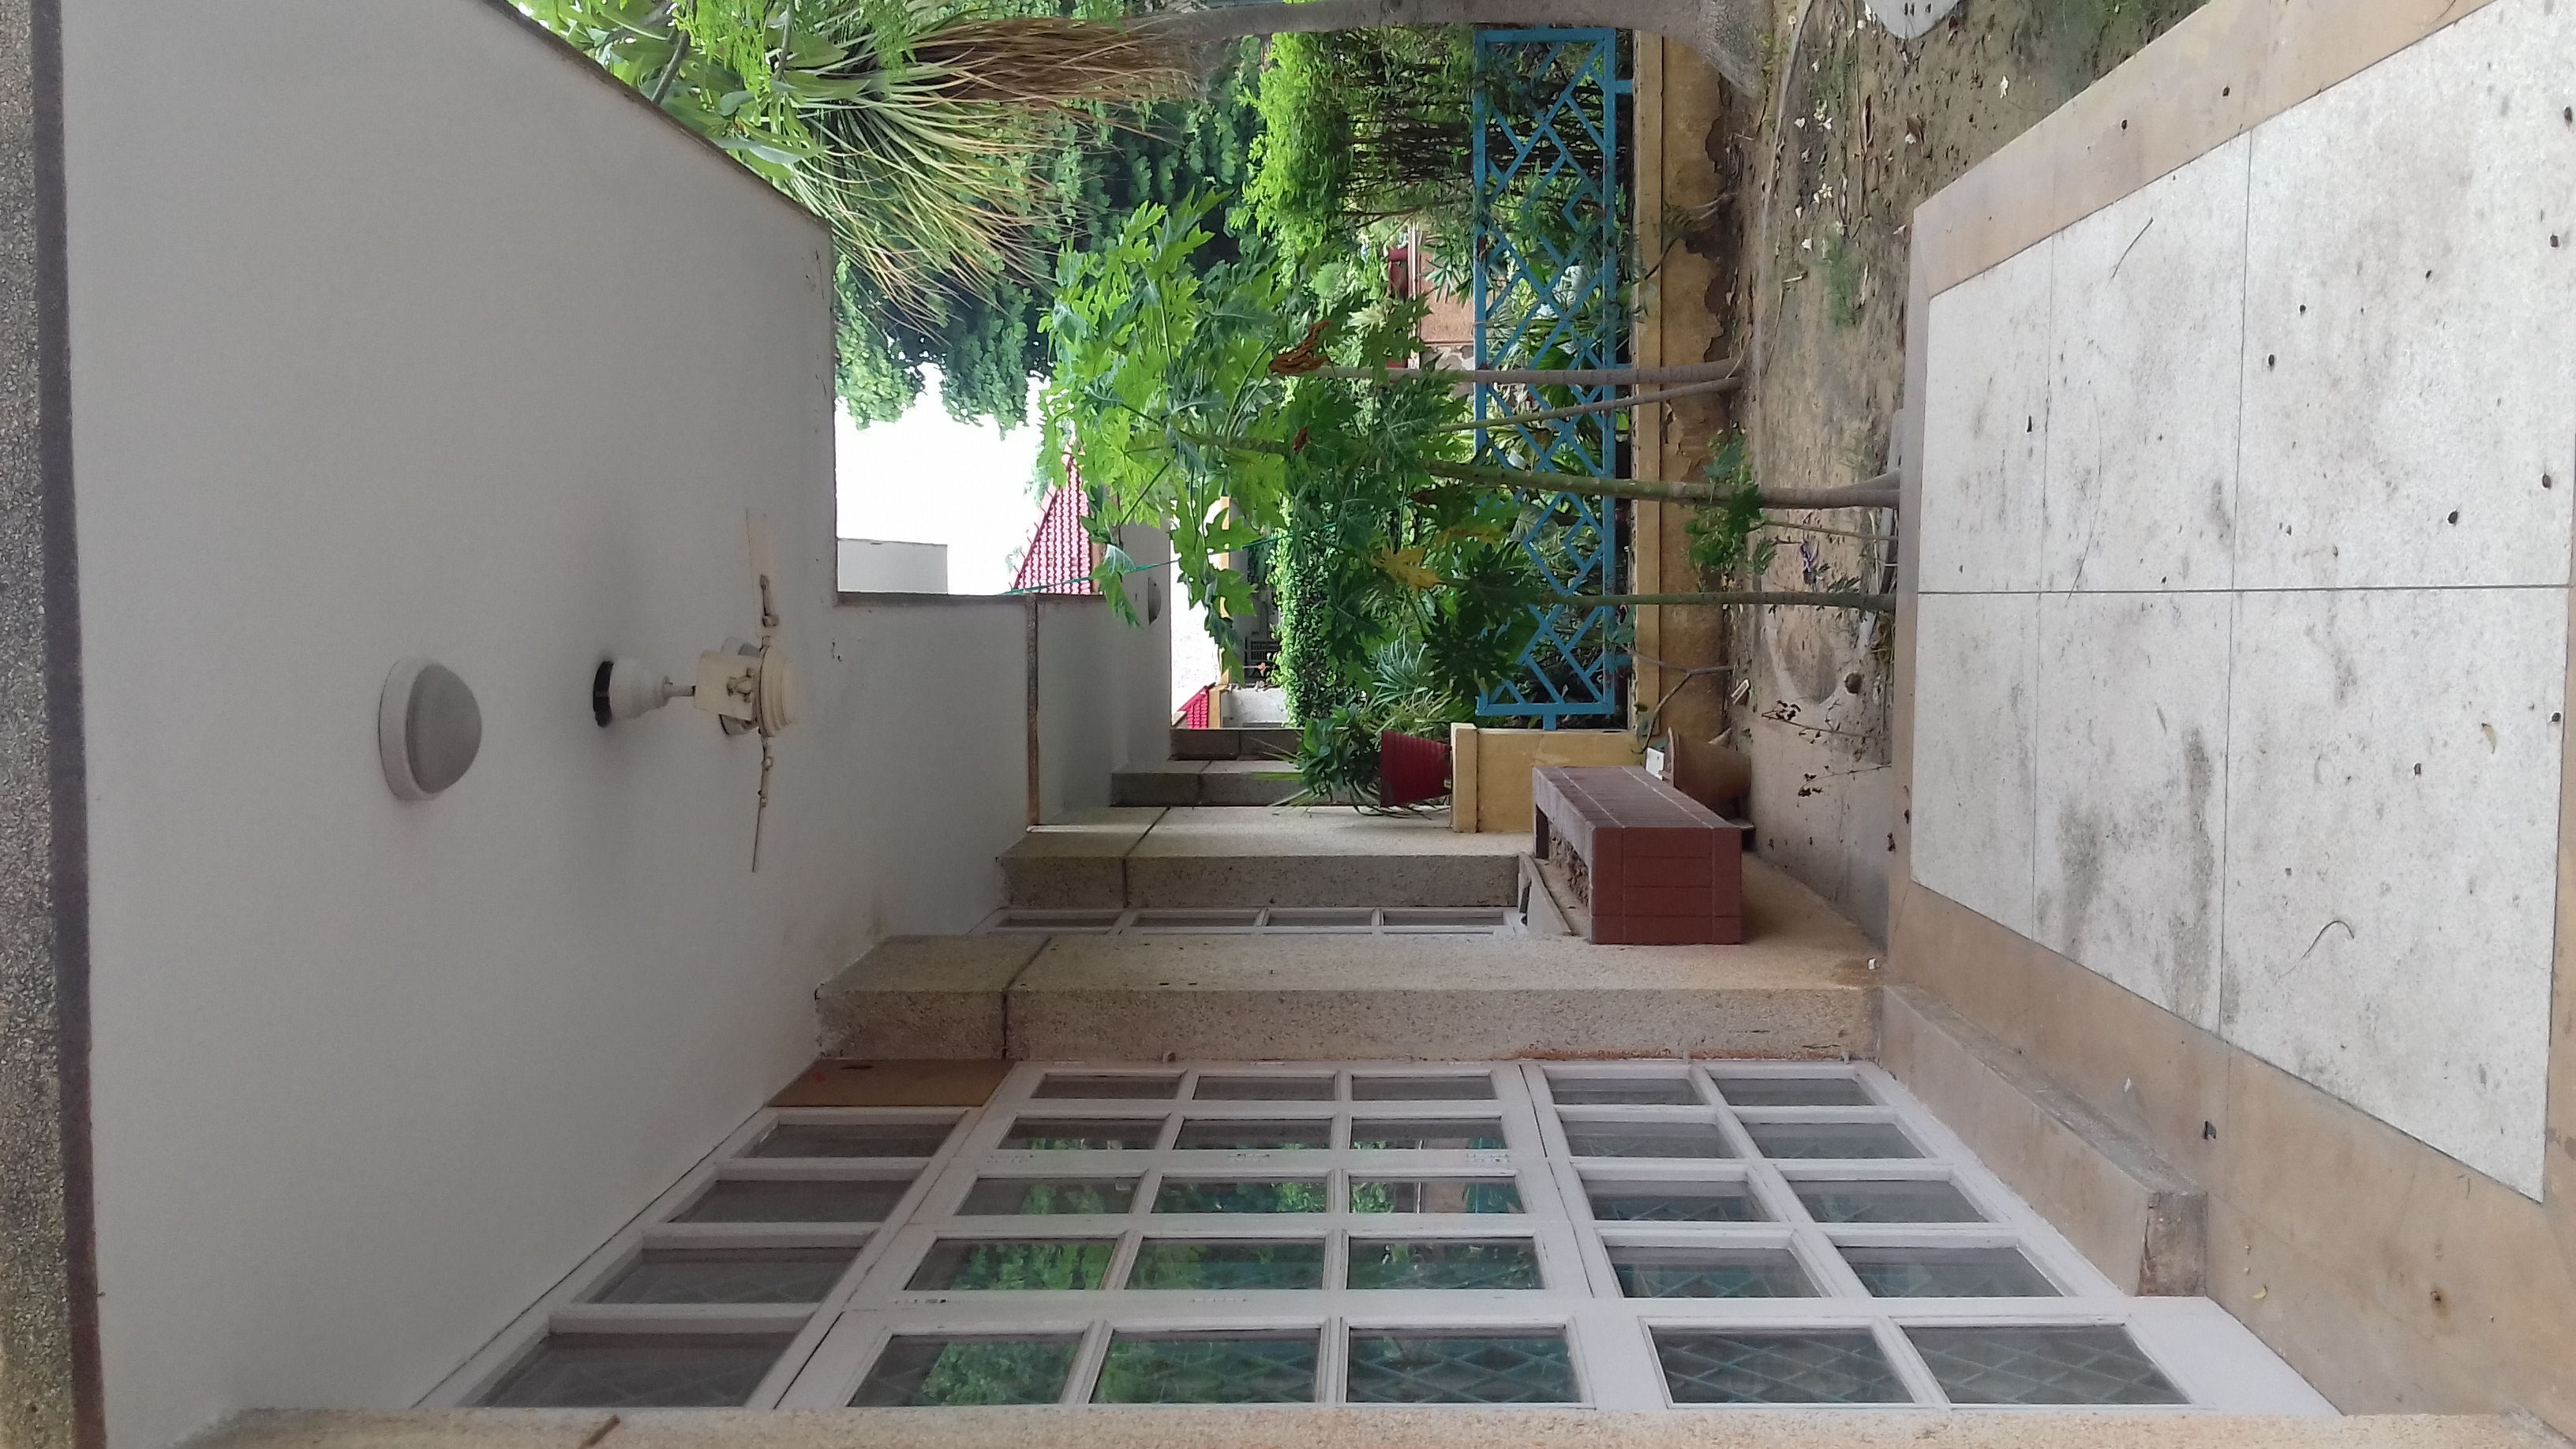 3 BHK + Servant Room  Villa For Rent in Unitech Greenwood City Apartment